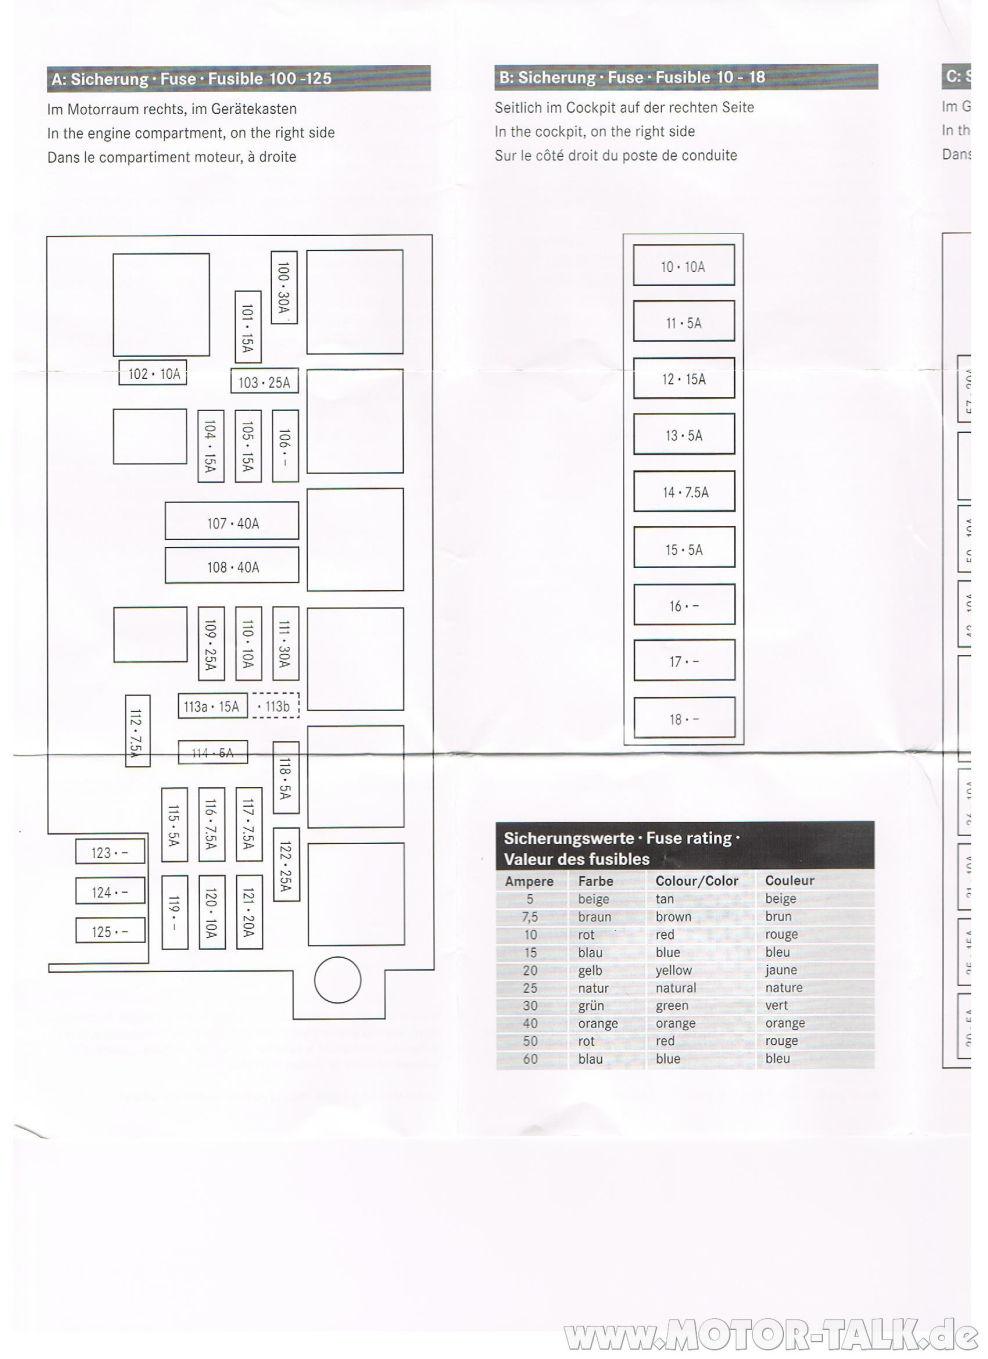 hight resolution of mercedes gl450 fuse chart nemetas aufgegabelt info belegungsplan 2 elektrische sitzverstellung defekt 2014 gl450 fuse chart